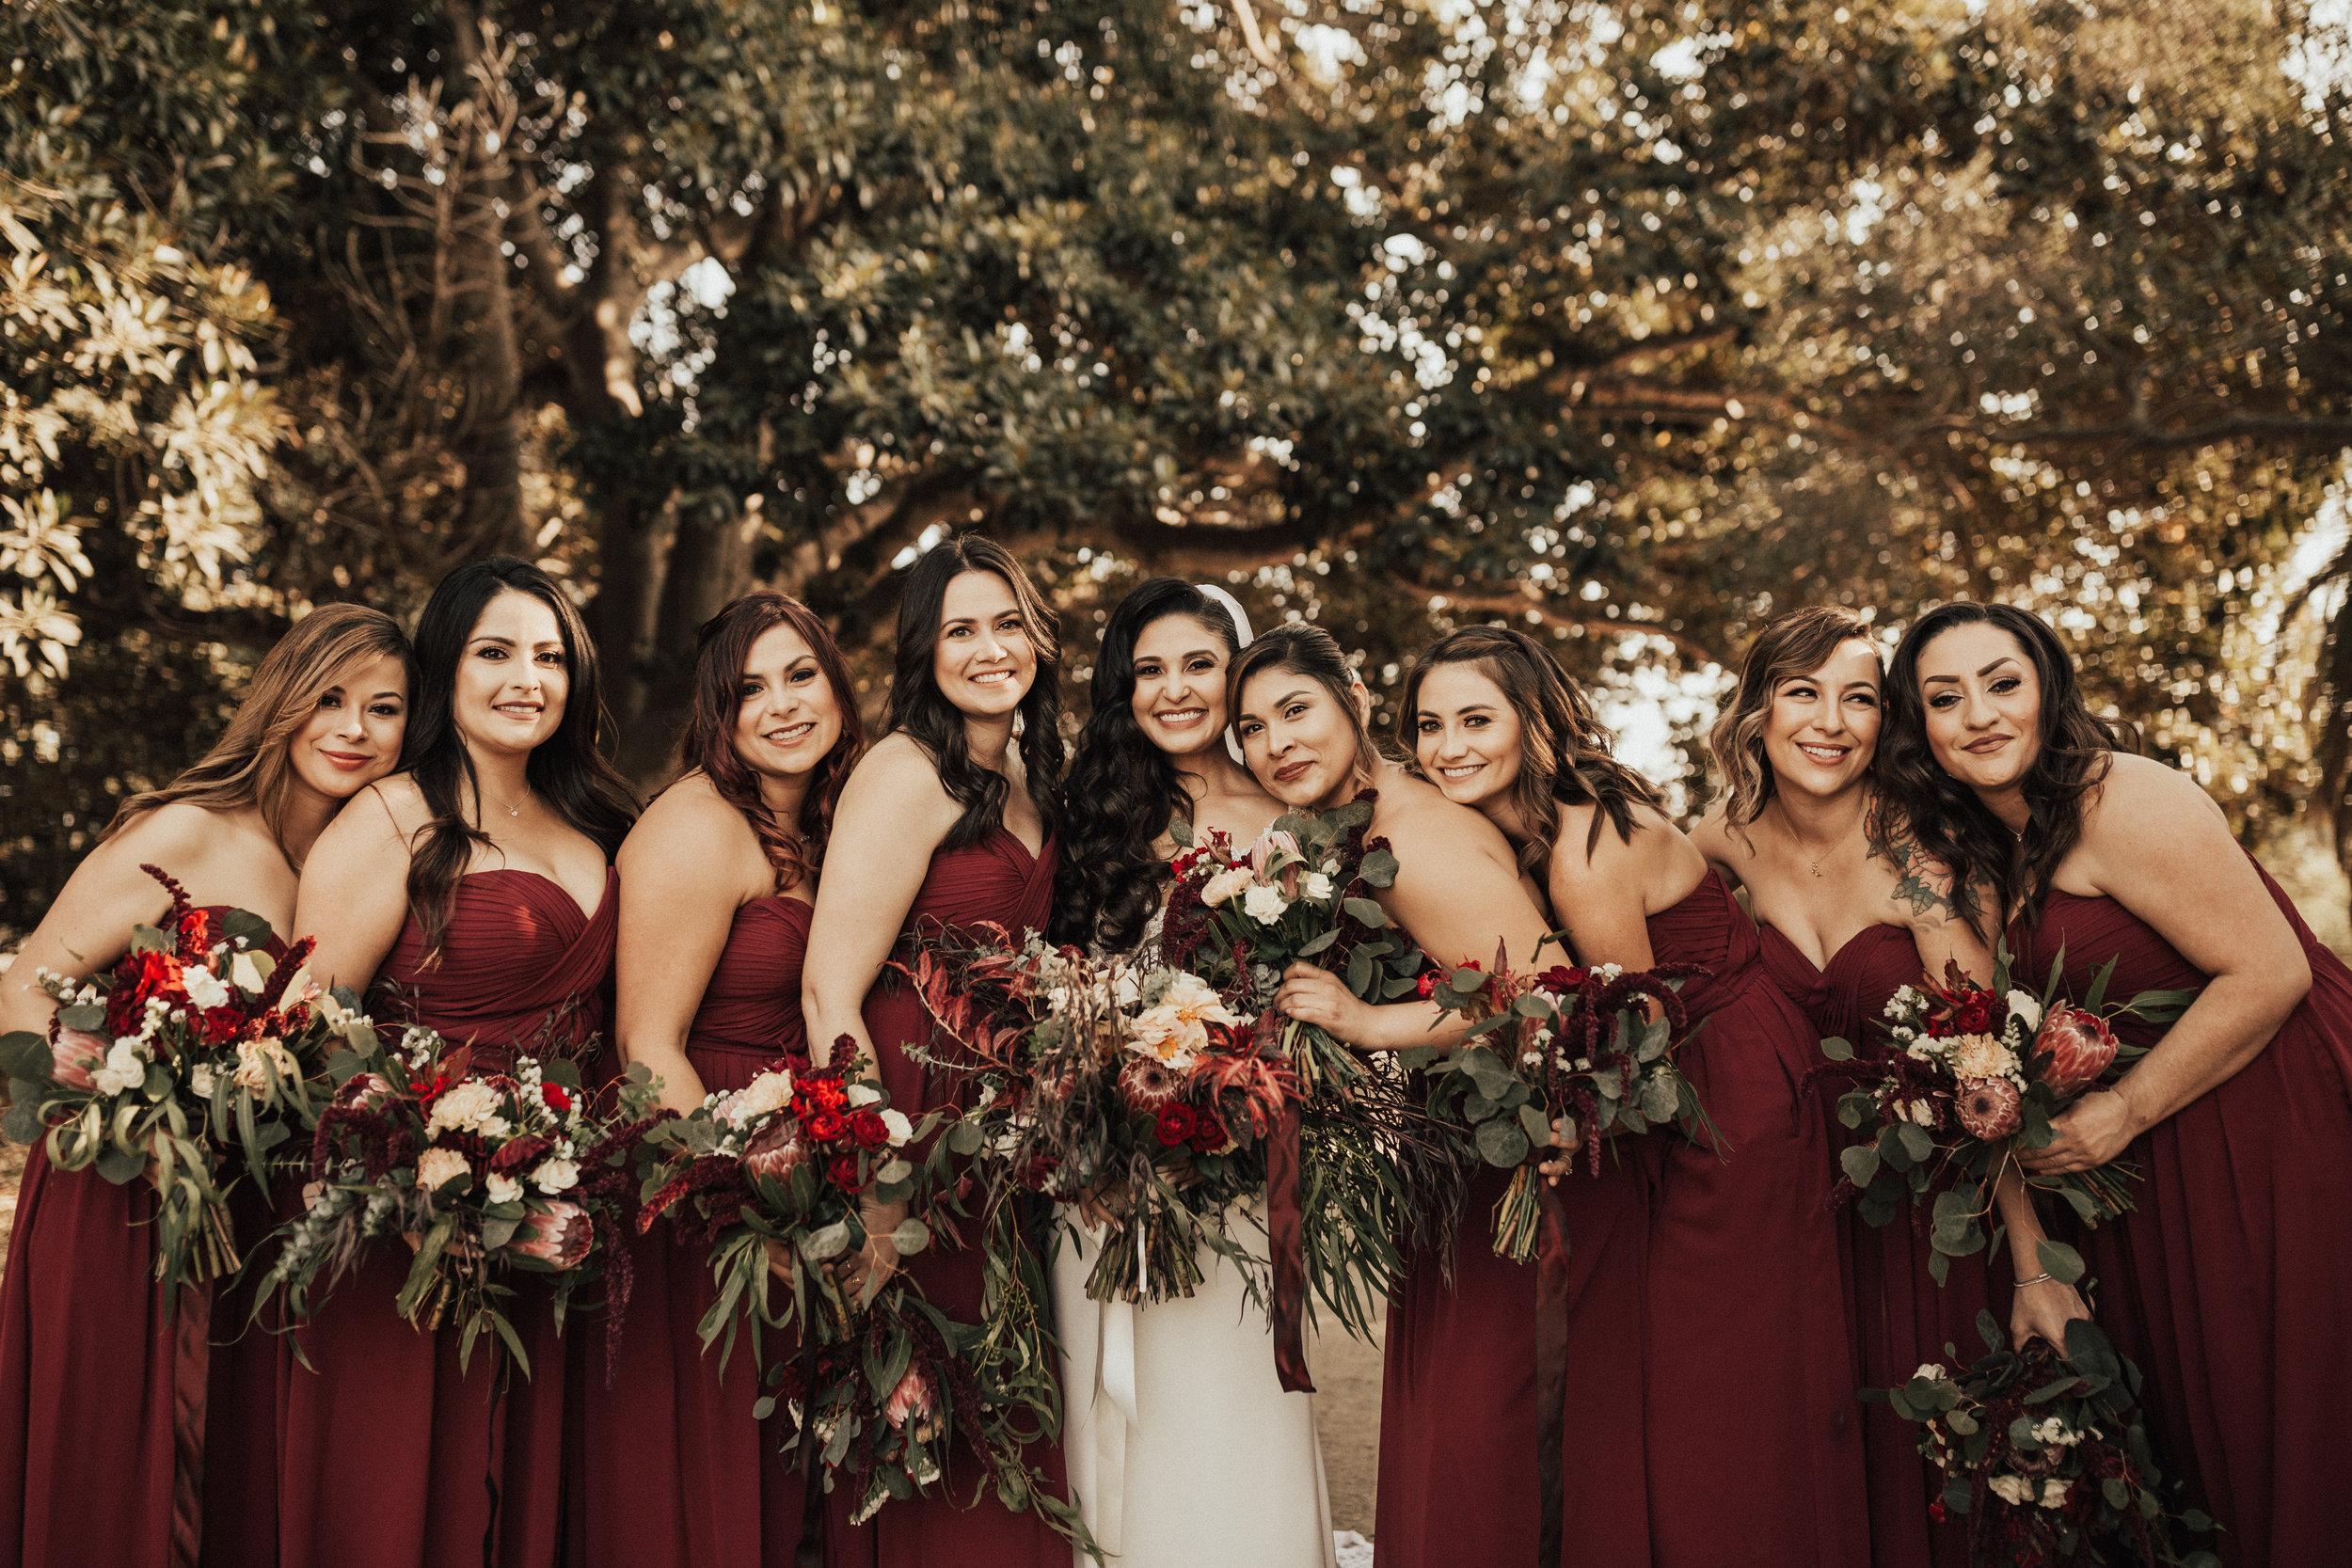 JessicaVictor-SantaBarbara-OrchidFarms-Wedding-246.jpg